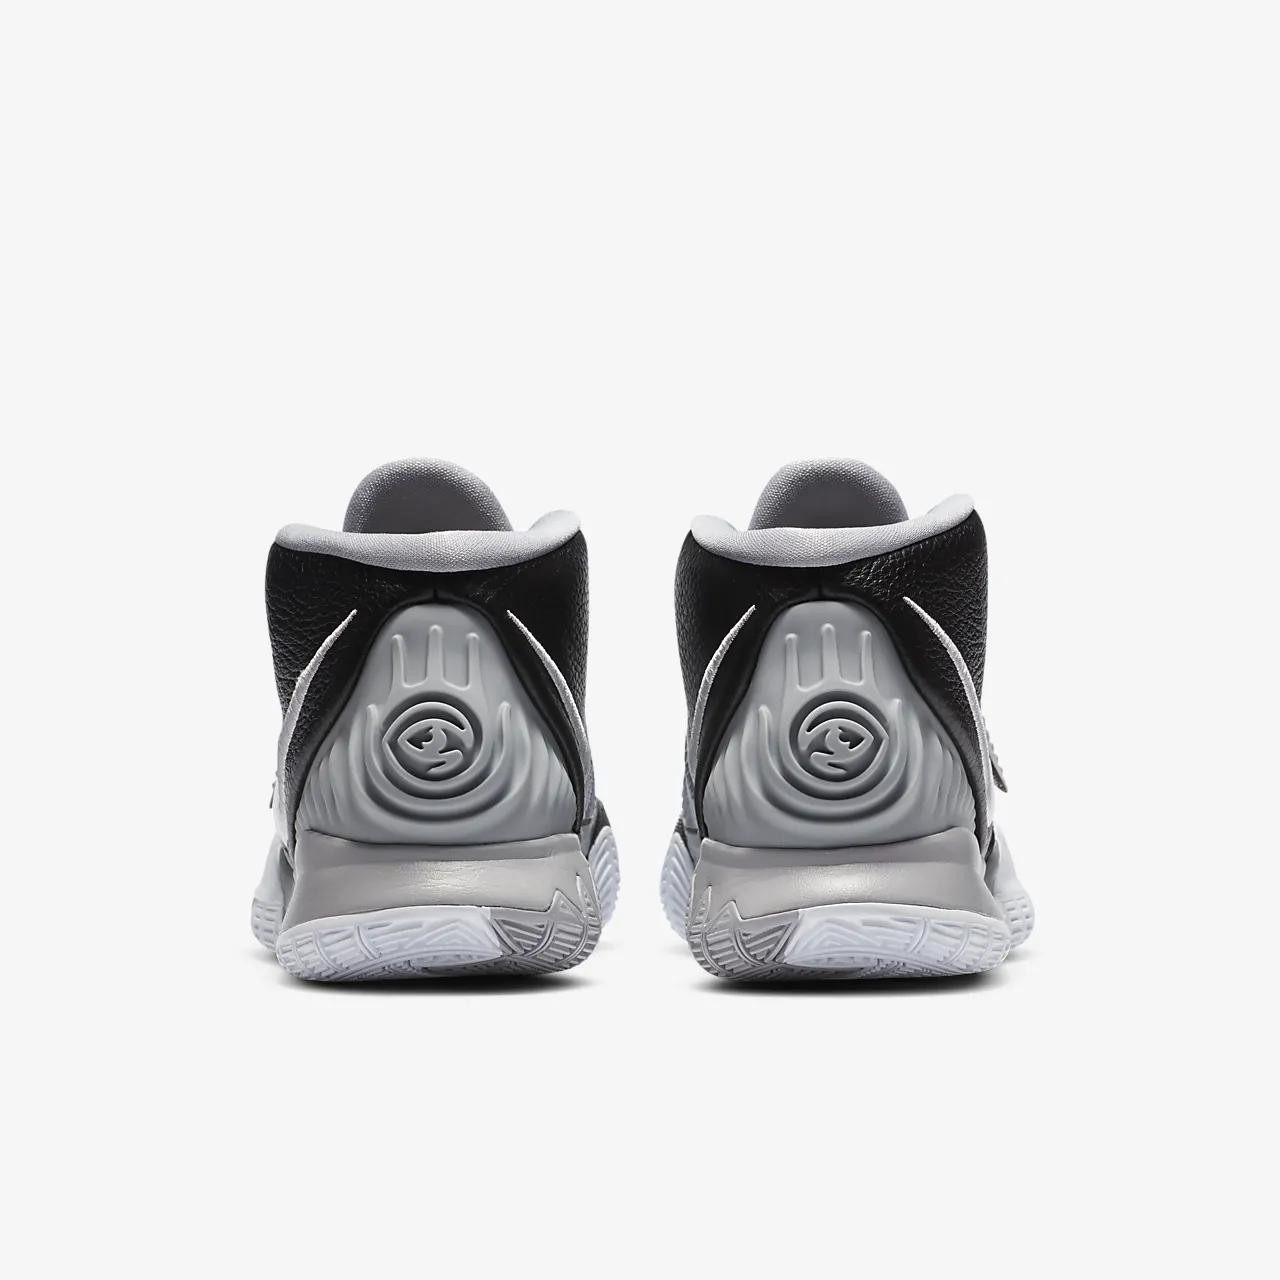 Kyrie 6 (Team) Basketball Shoe CK5869-001